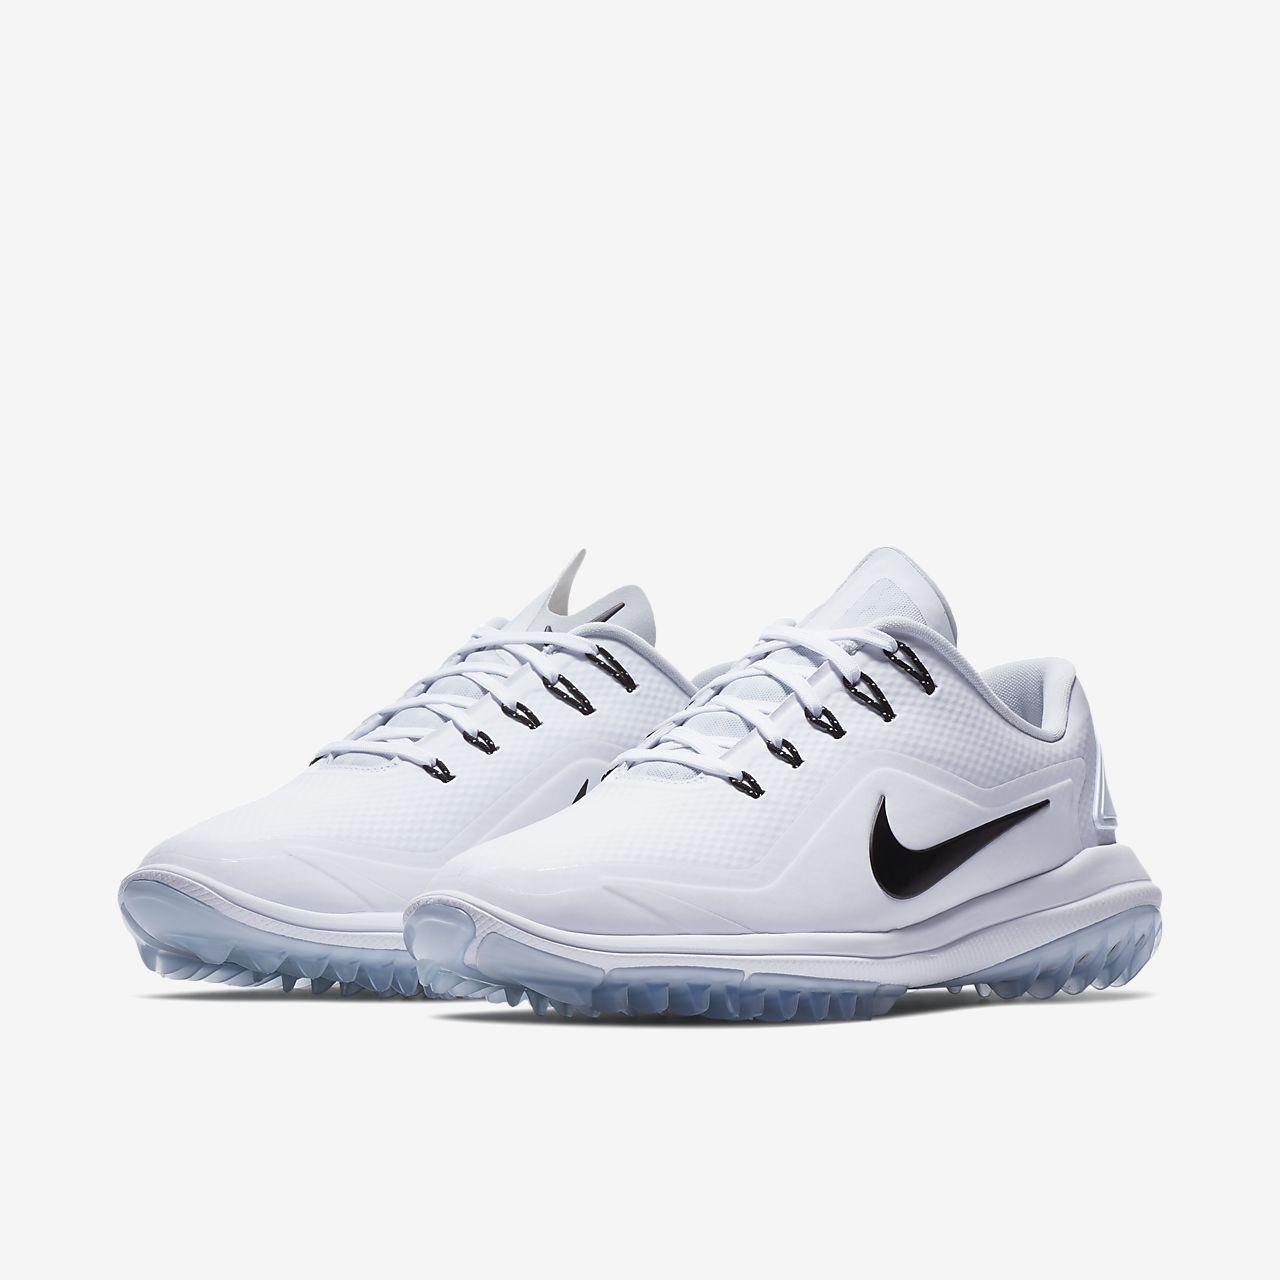 best service e3659 ce903 ... Nike Lunar Control Vapor 2 Women s Golf Shoe